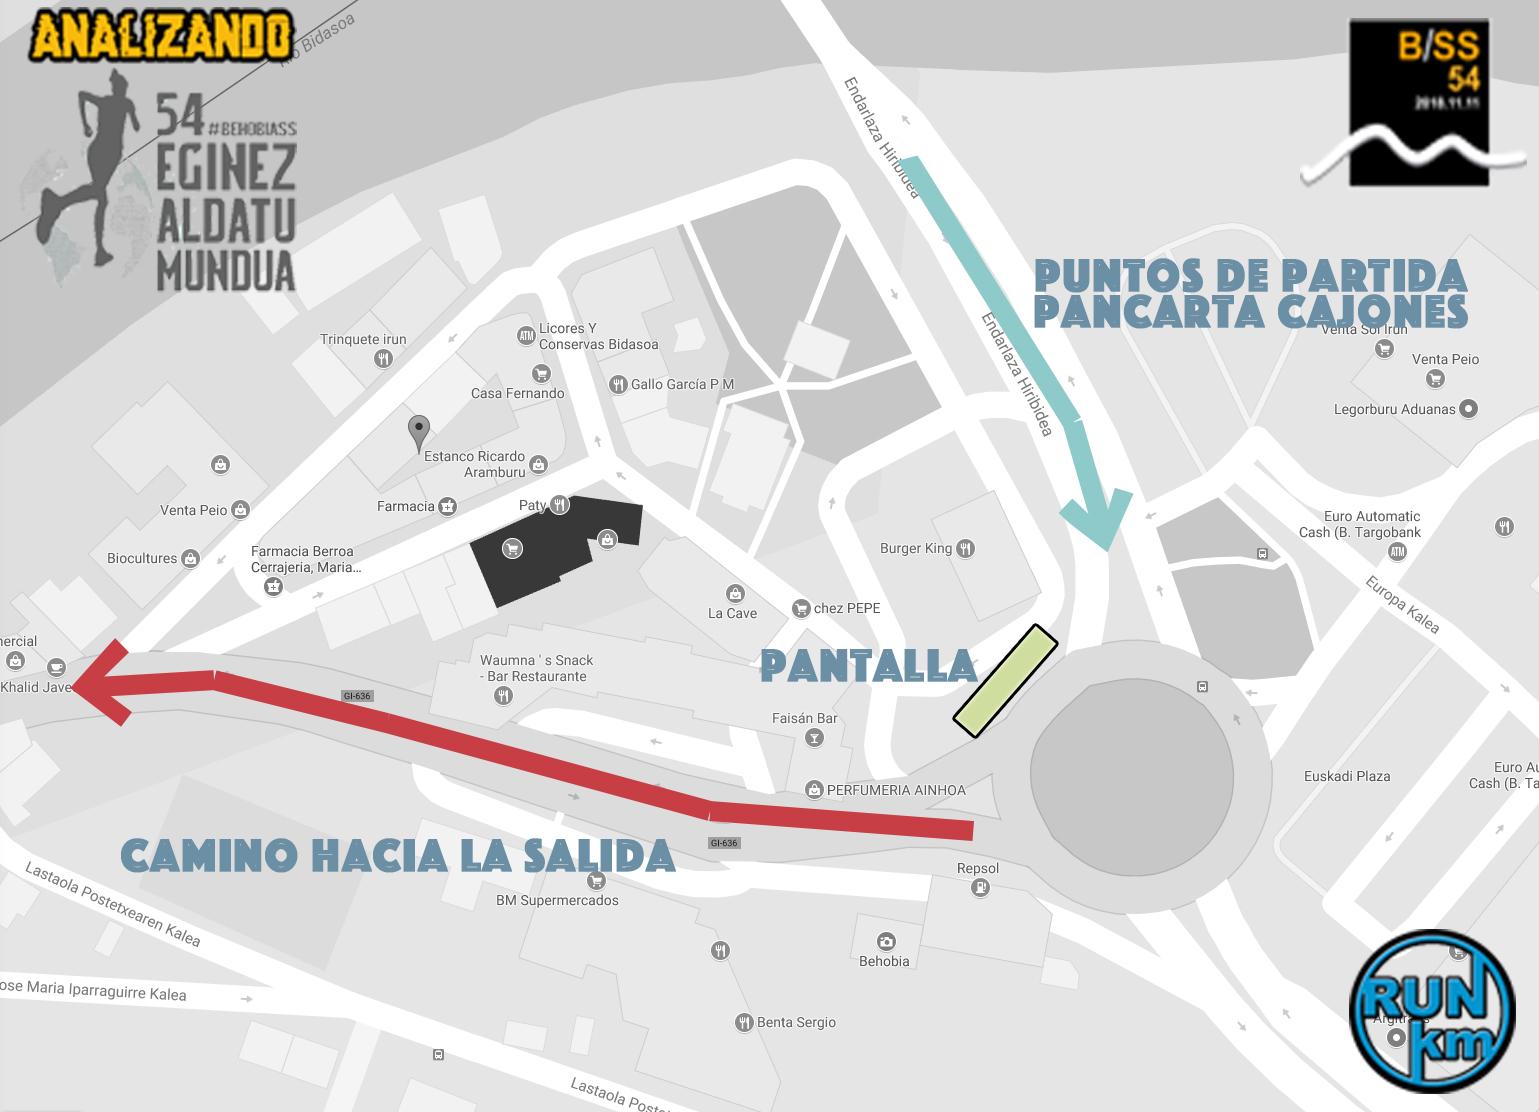 Analizando Behobia - San Sebastián 2018 [ BSS54 ]